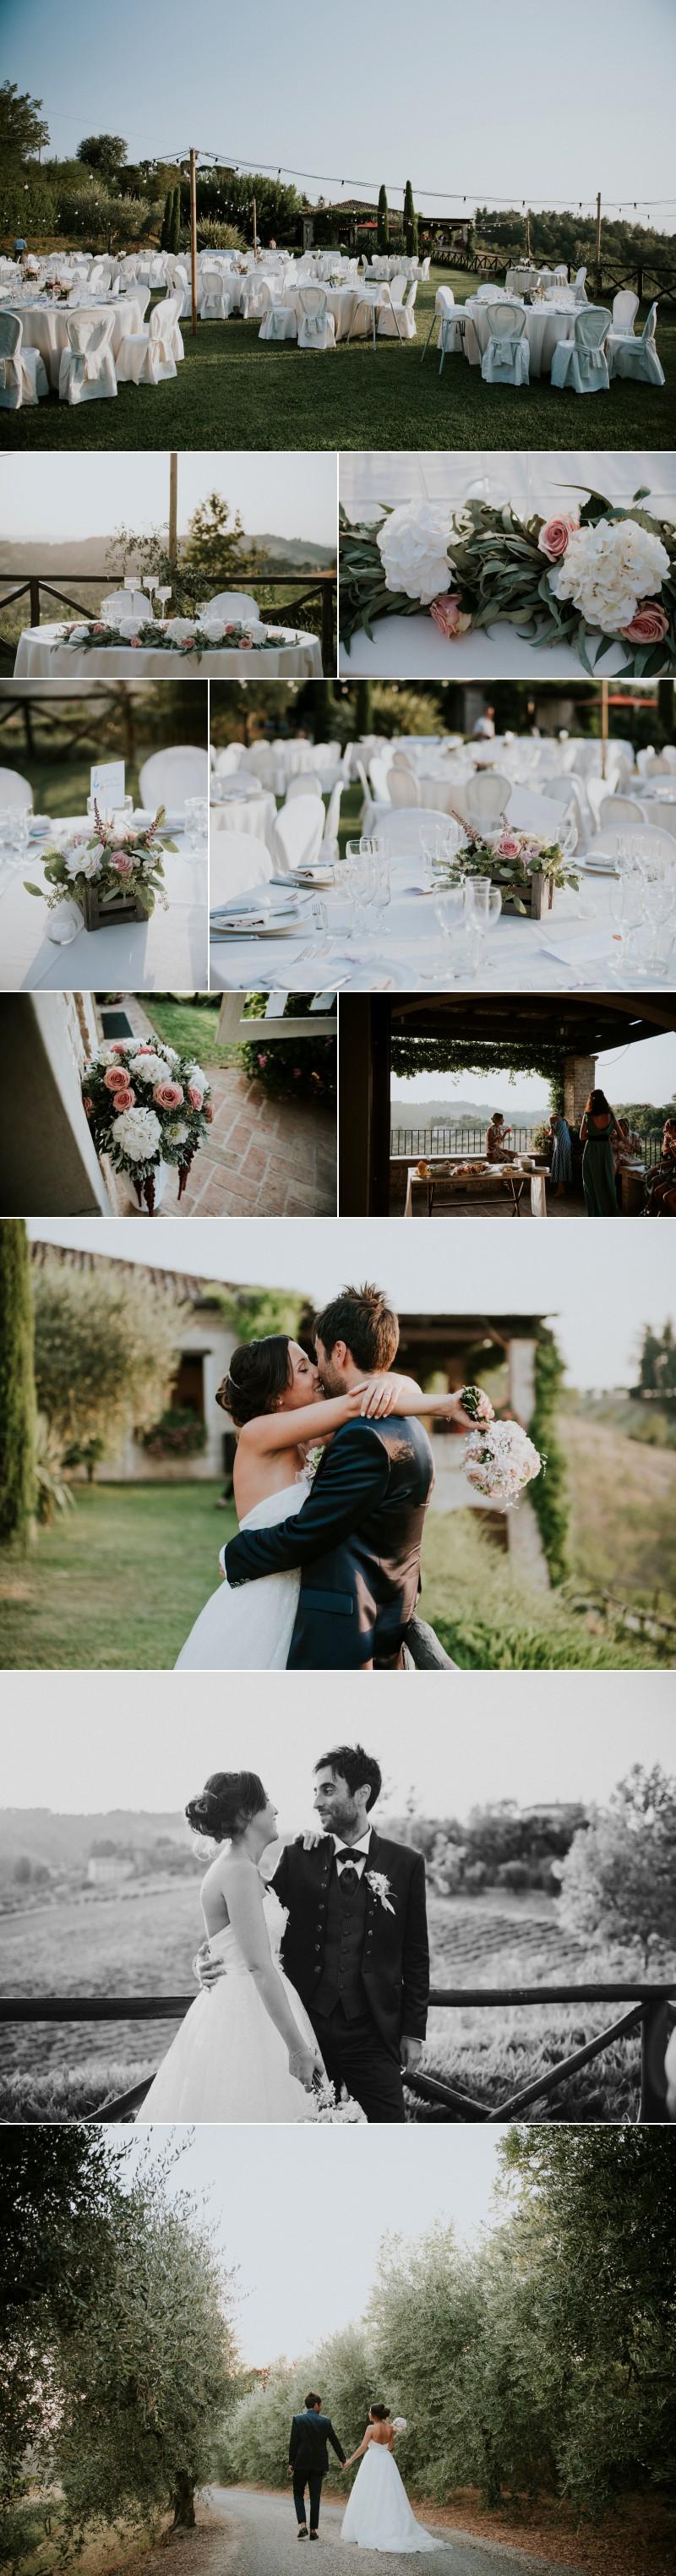 Fotografo Matrimonio Casa Celincordia Cesena 900